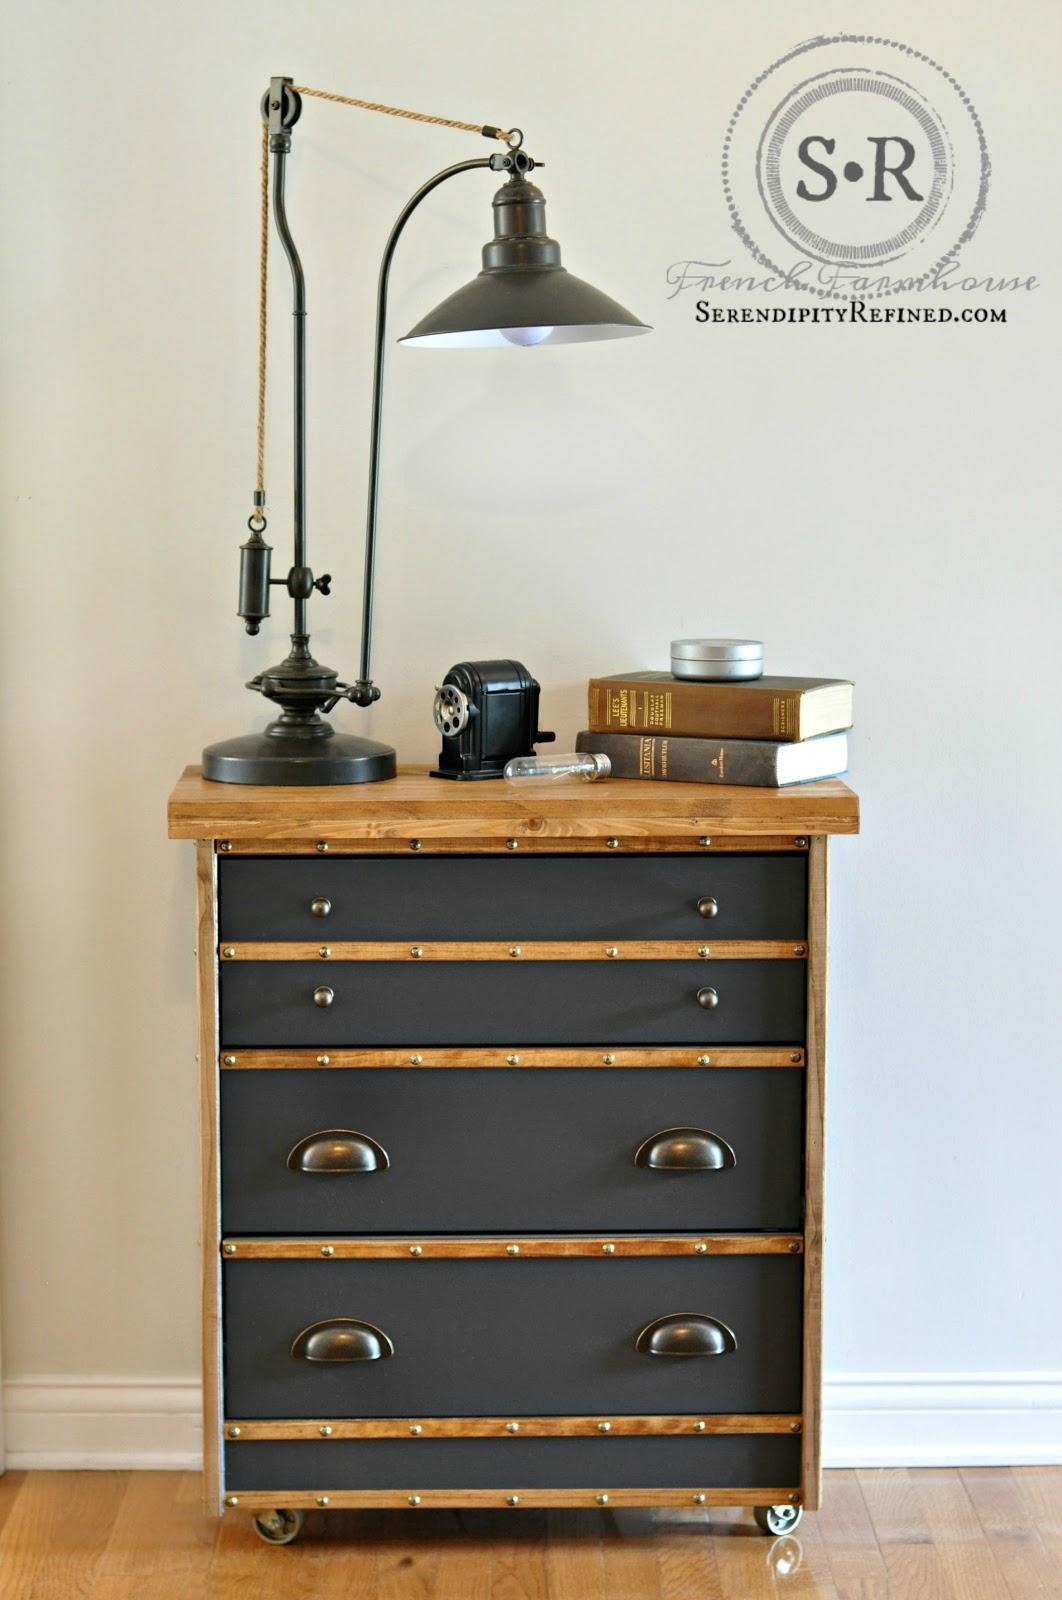 serendipity refined blog ikea rast hack industrial. Black Bedroom Furniture Sets. Home Design Ideas